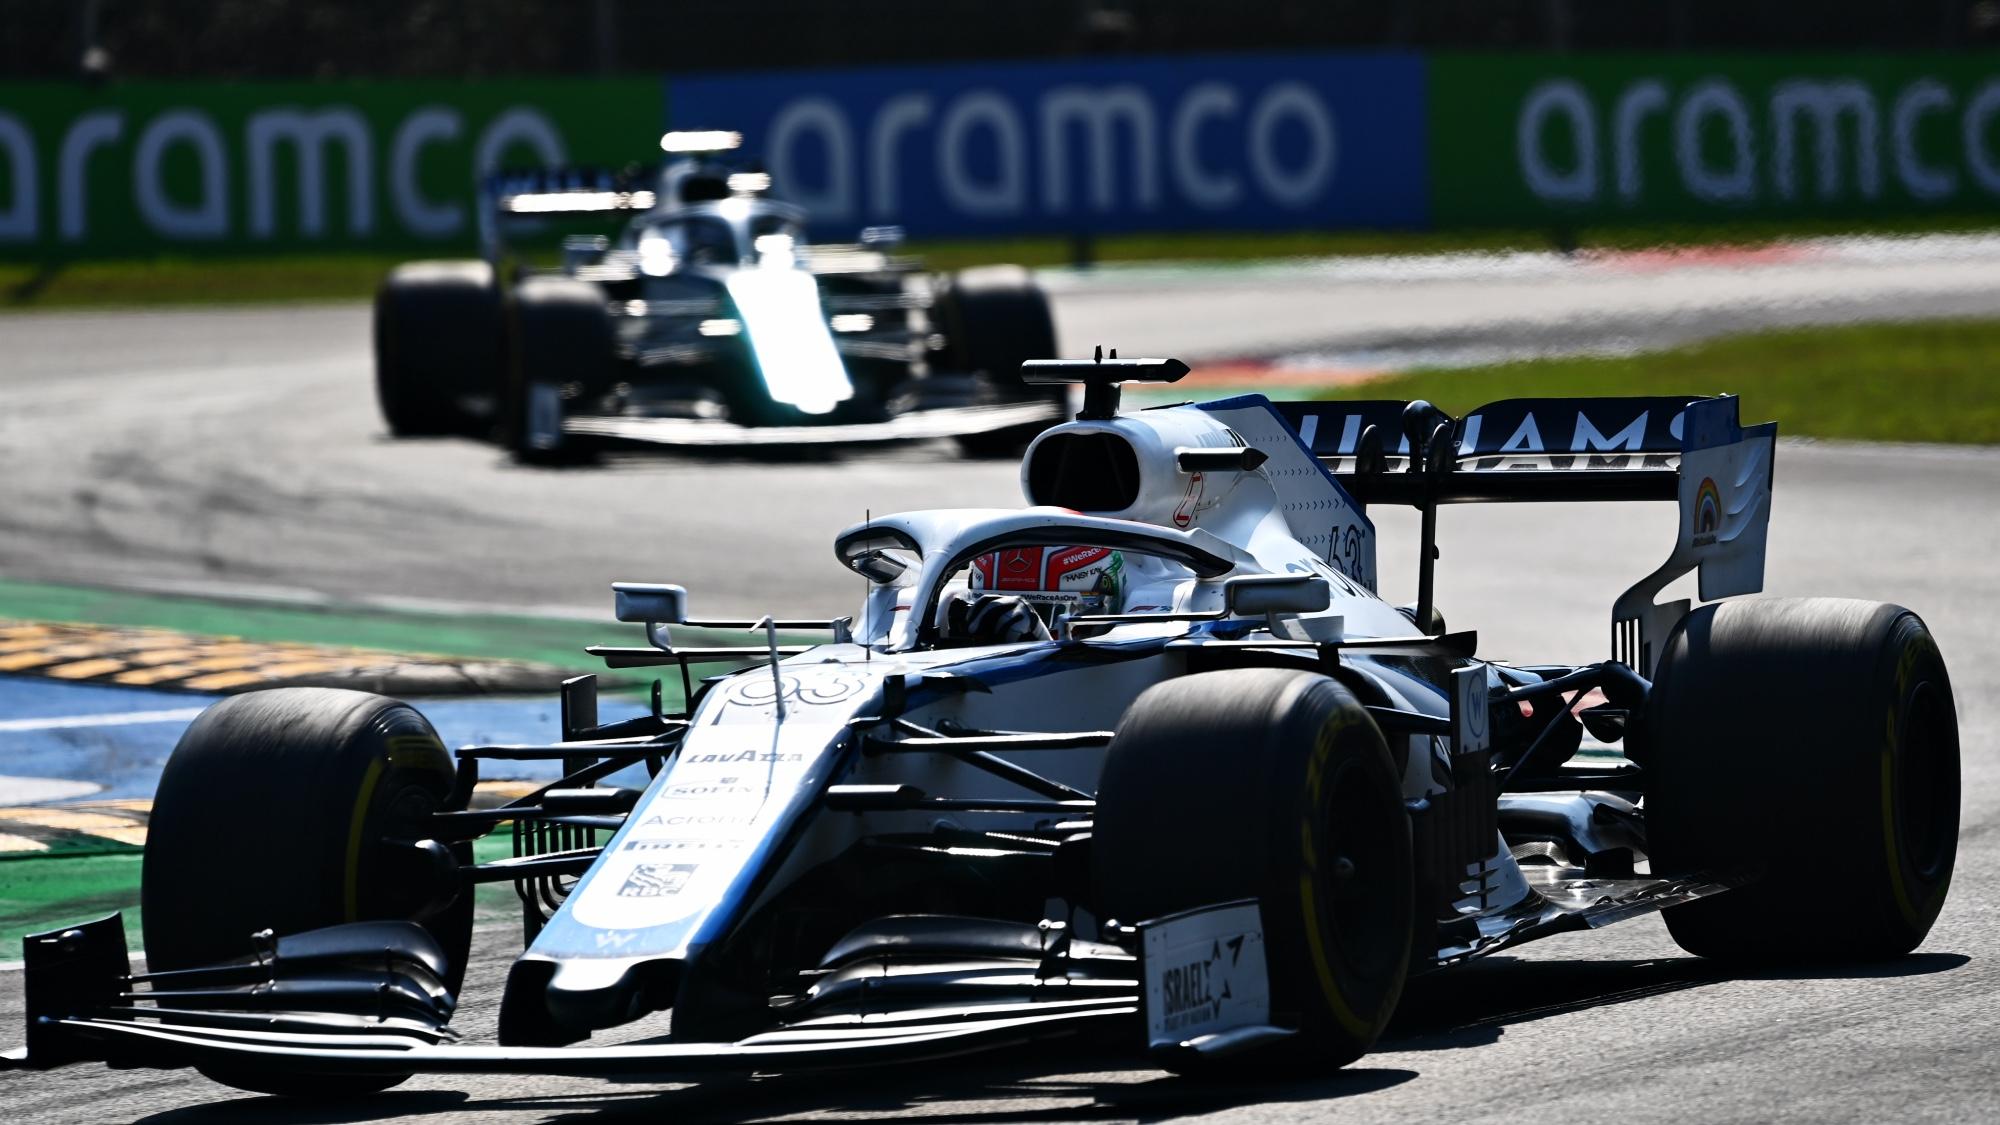 Williams, 2020 Italian GP